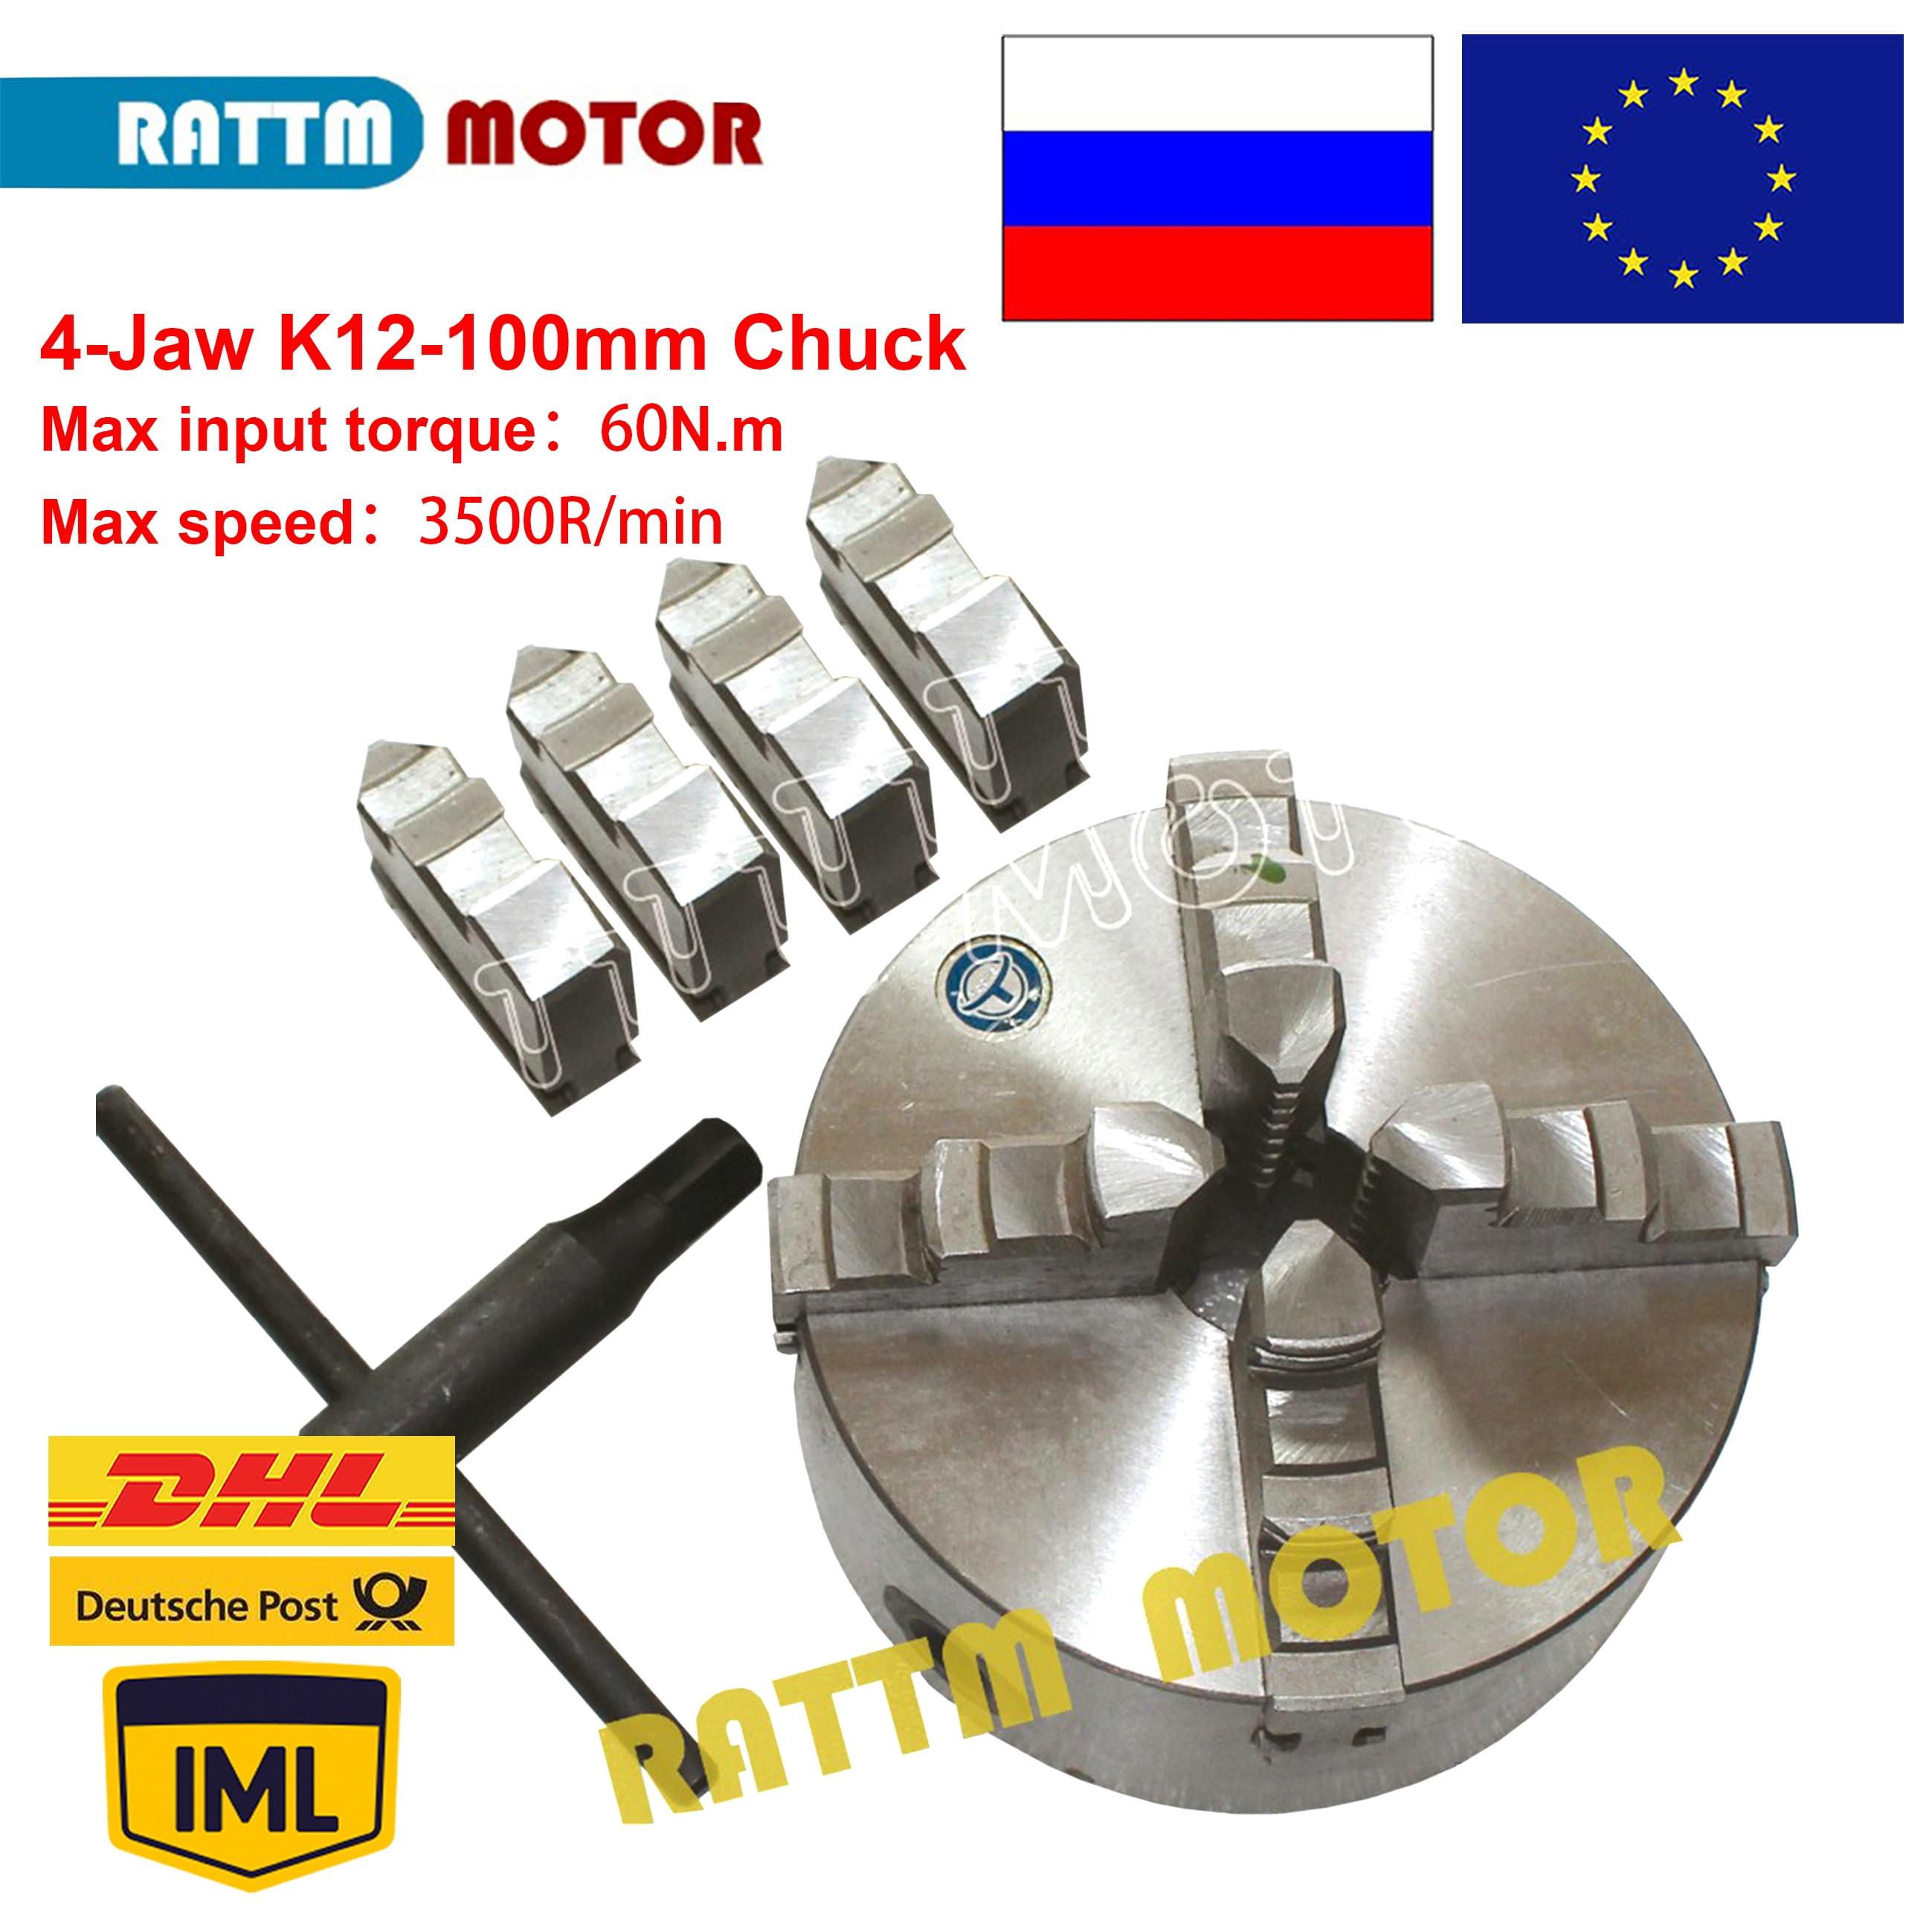 4 jaw 100mm self centering chuck 60N m 4 jaw chuck Machine tool Lathe chuck K12